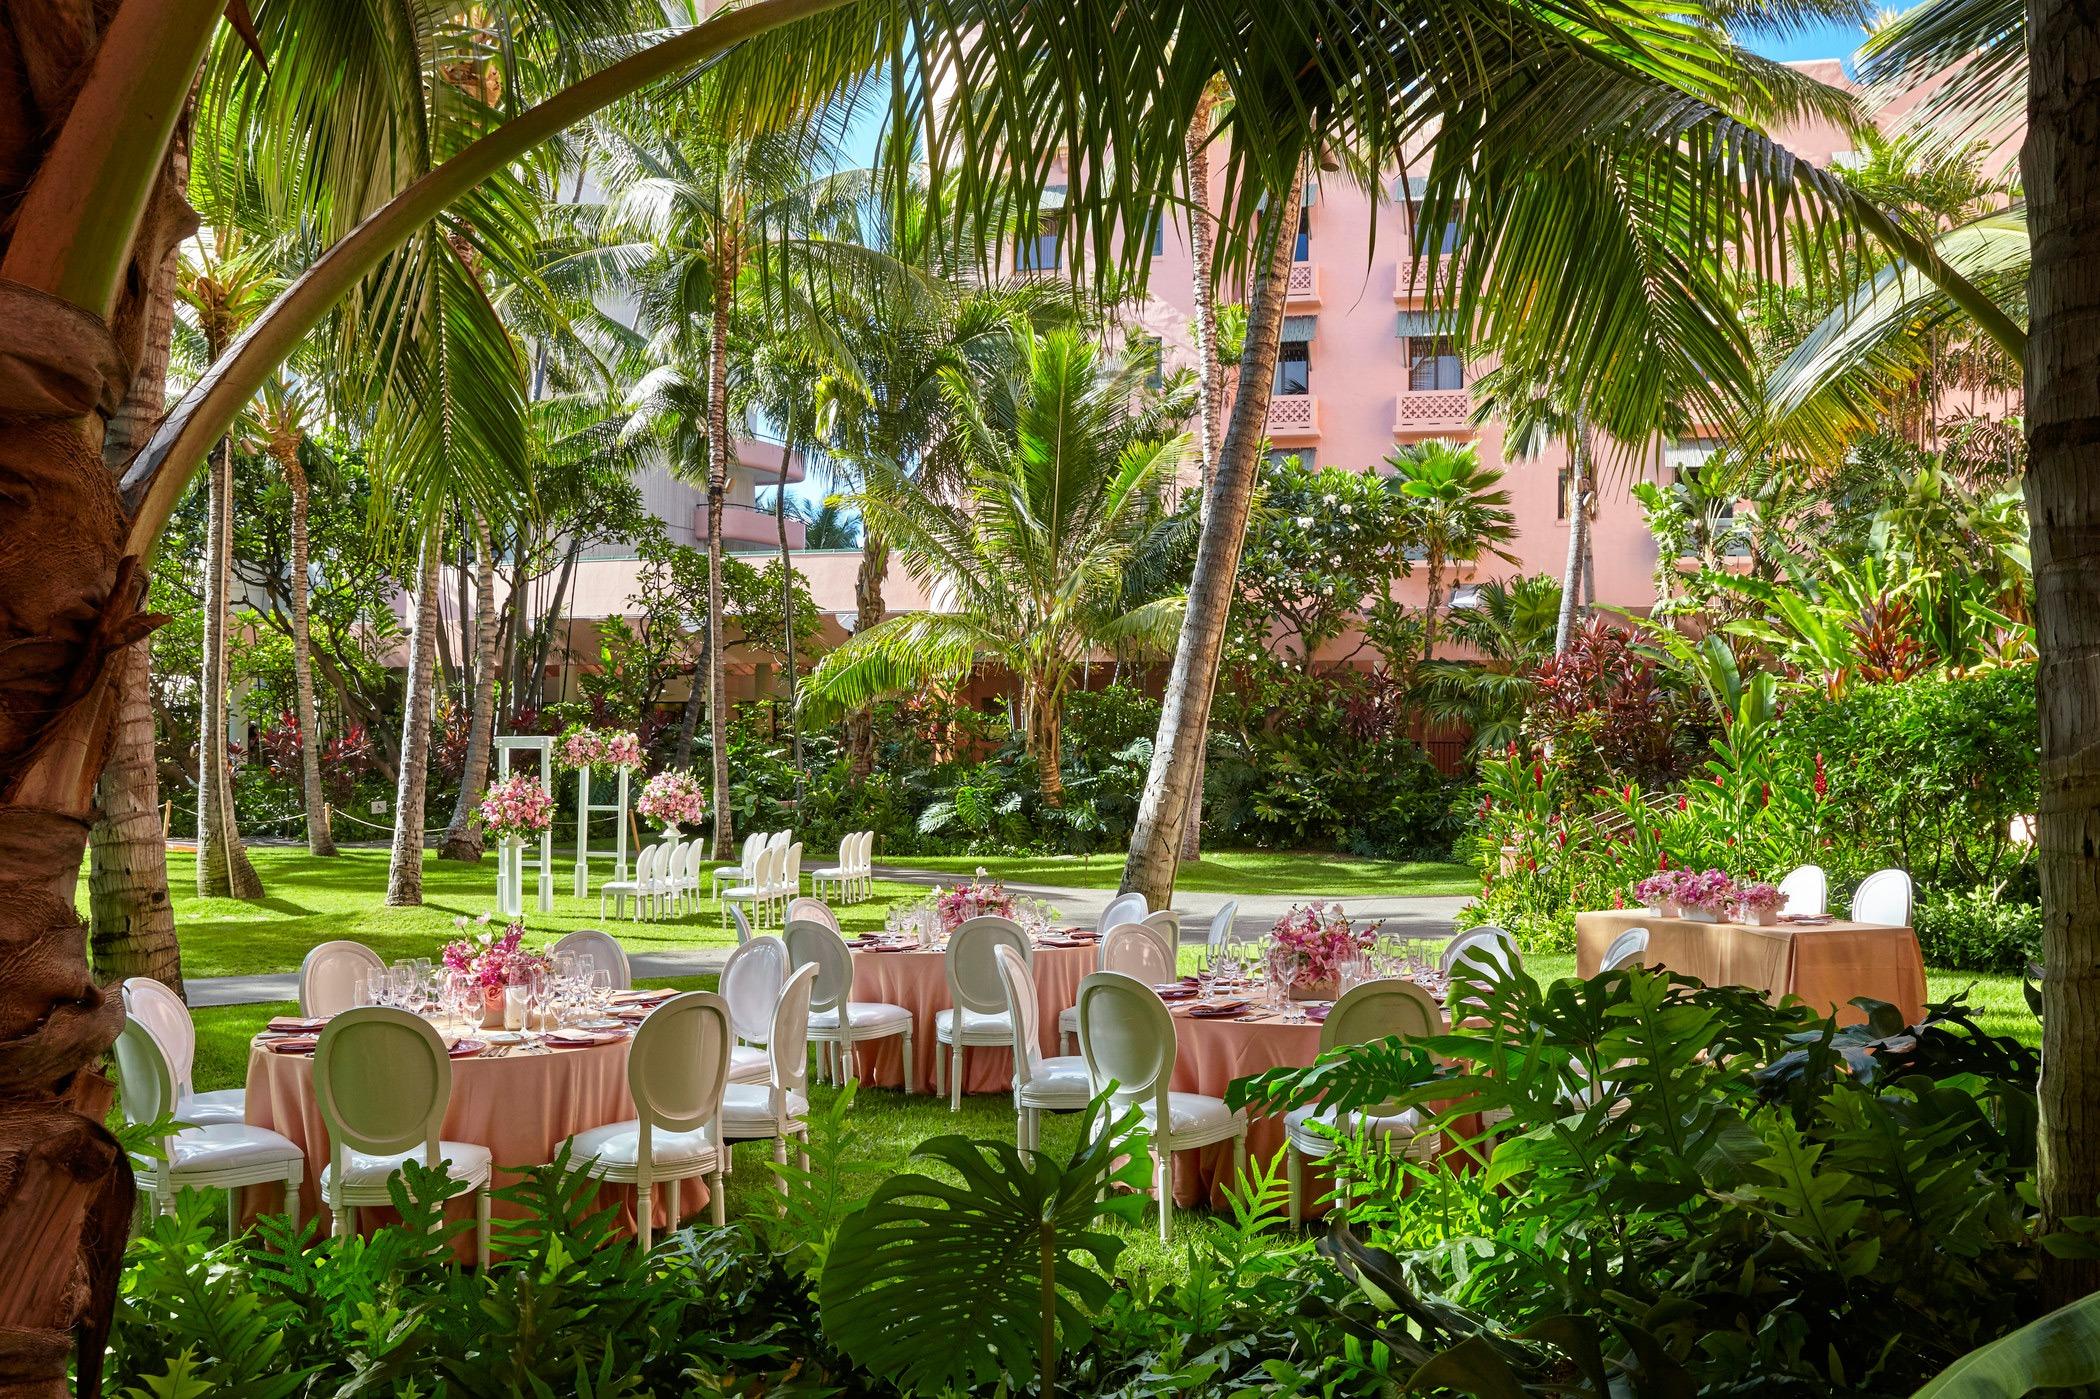 tables setup for garden dining event in royal hawaiian garden